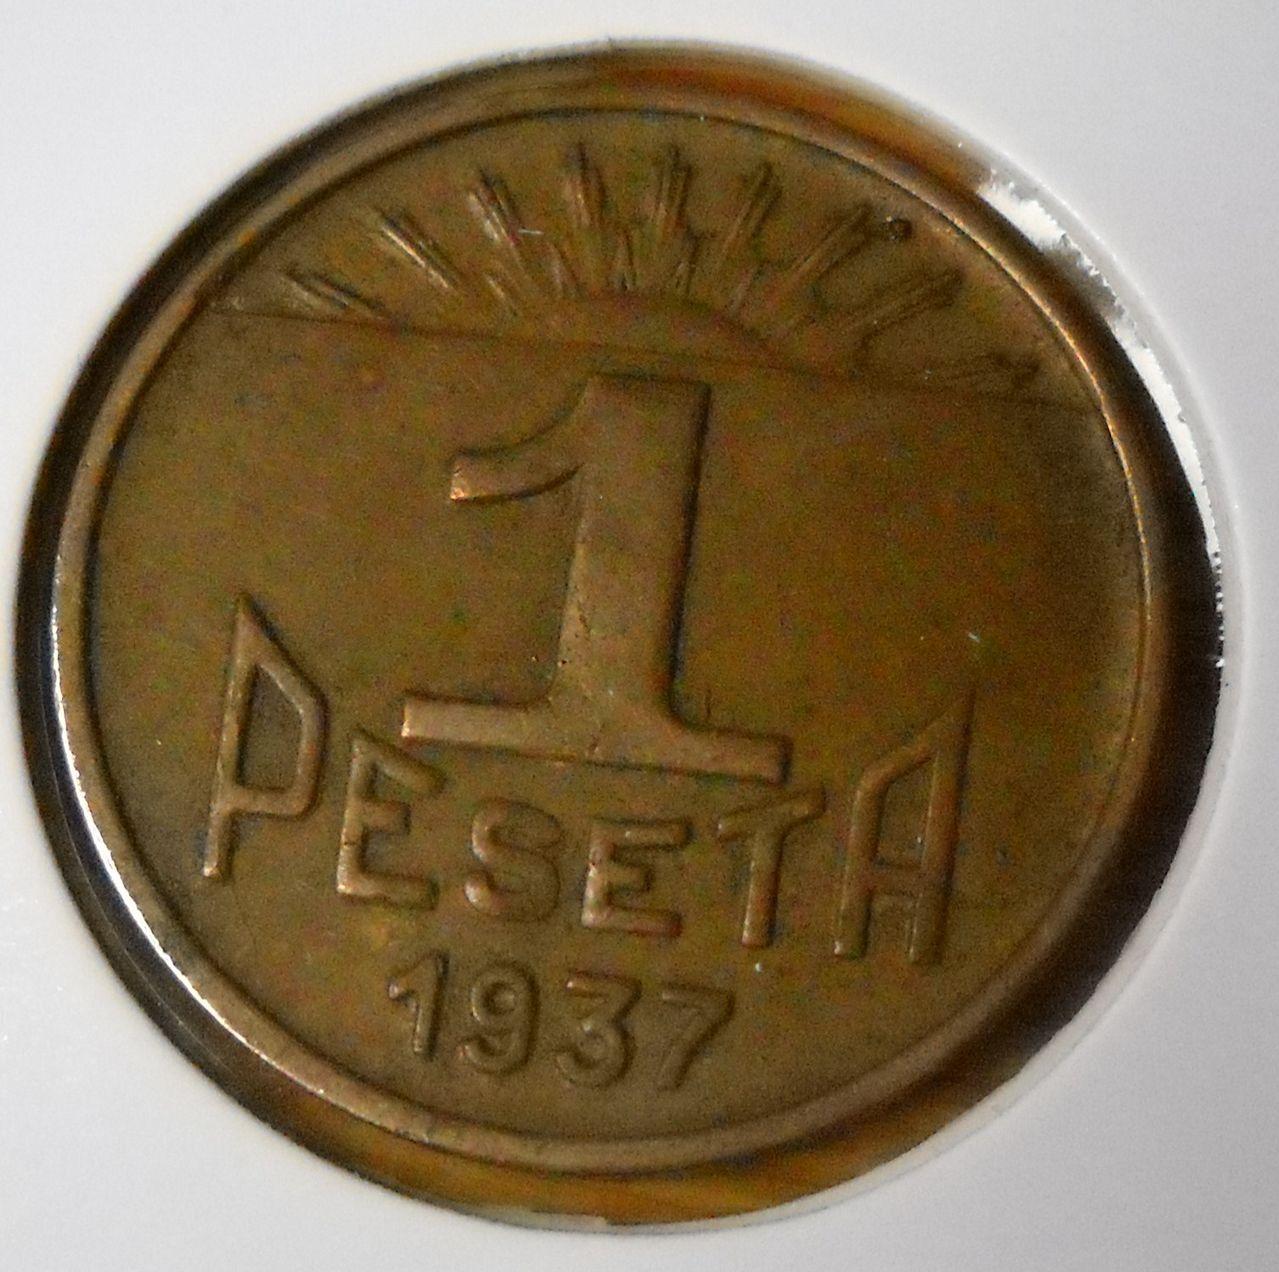 1 peseta 1937 Guerra Civil - Consejo de Asturias y Leon  DSCN0045